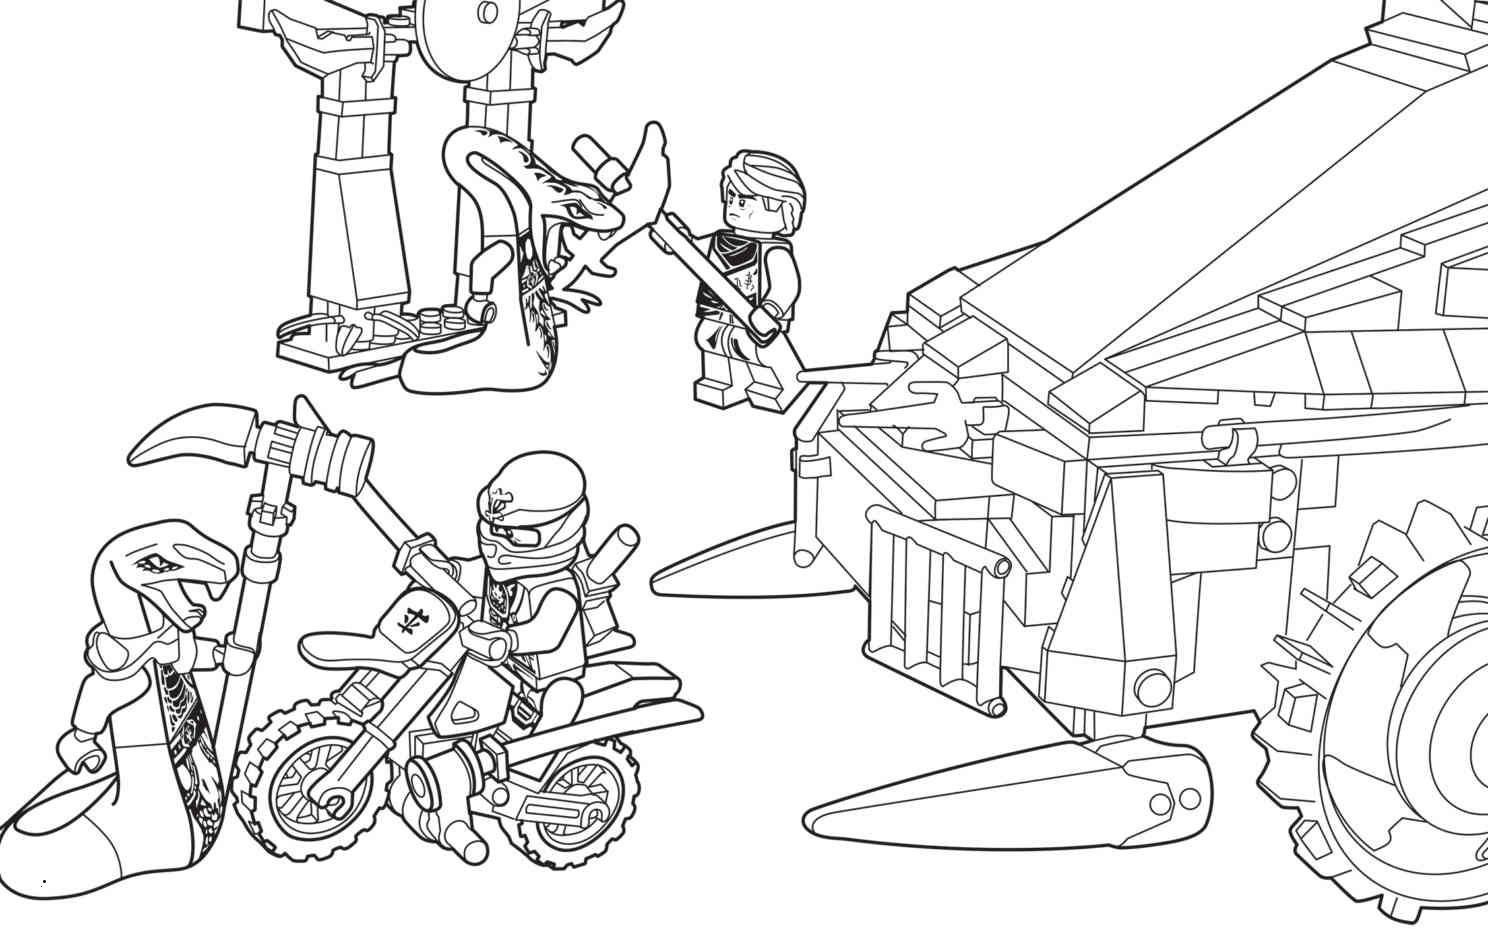 Ninjago Pythor Ausmalbilder Frisch 40 Genial Ausmalbilder Ninjago Zum Ausdrucken Frisch Ninjago Sammlung